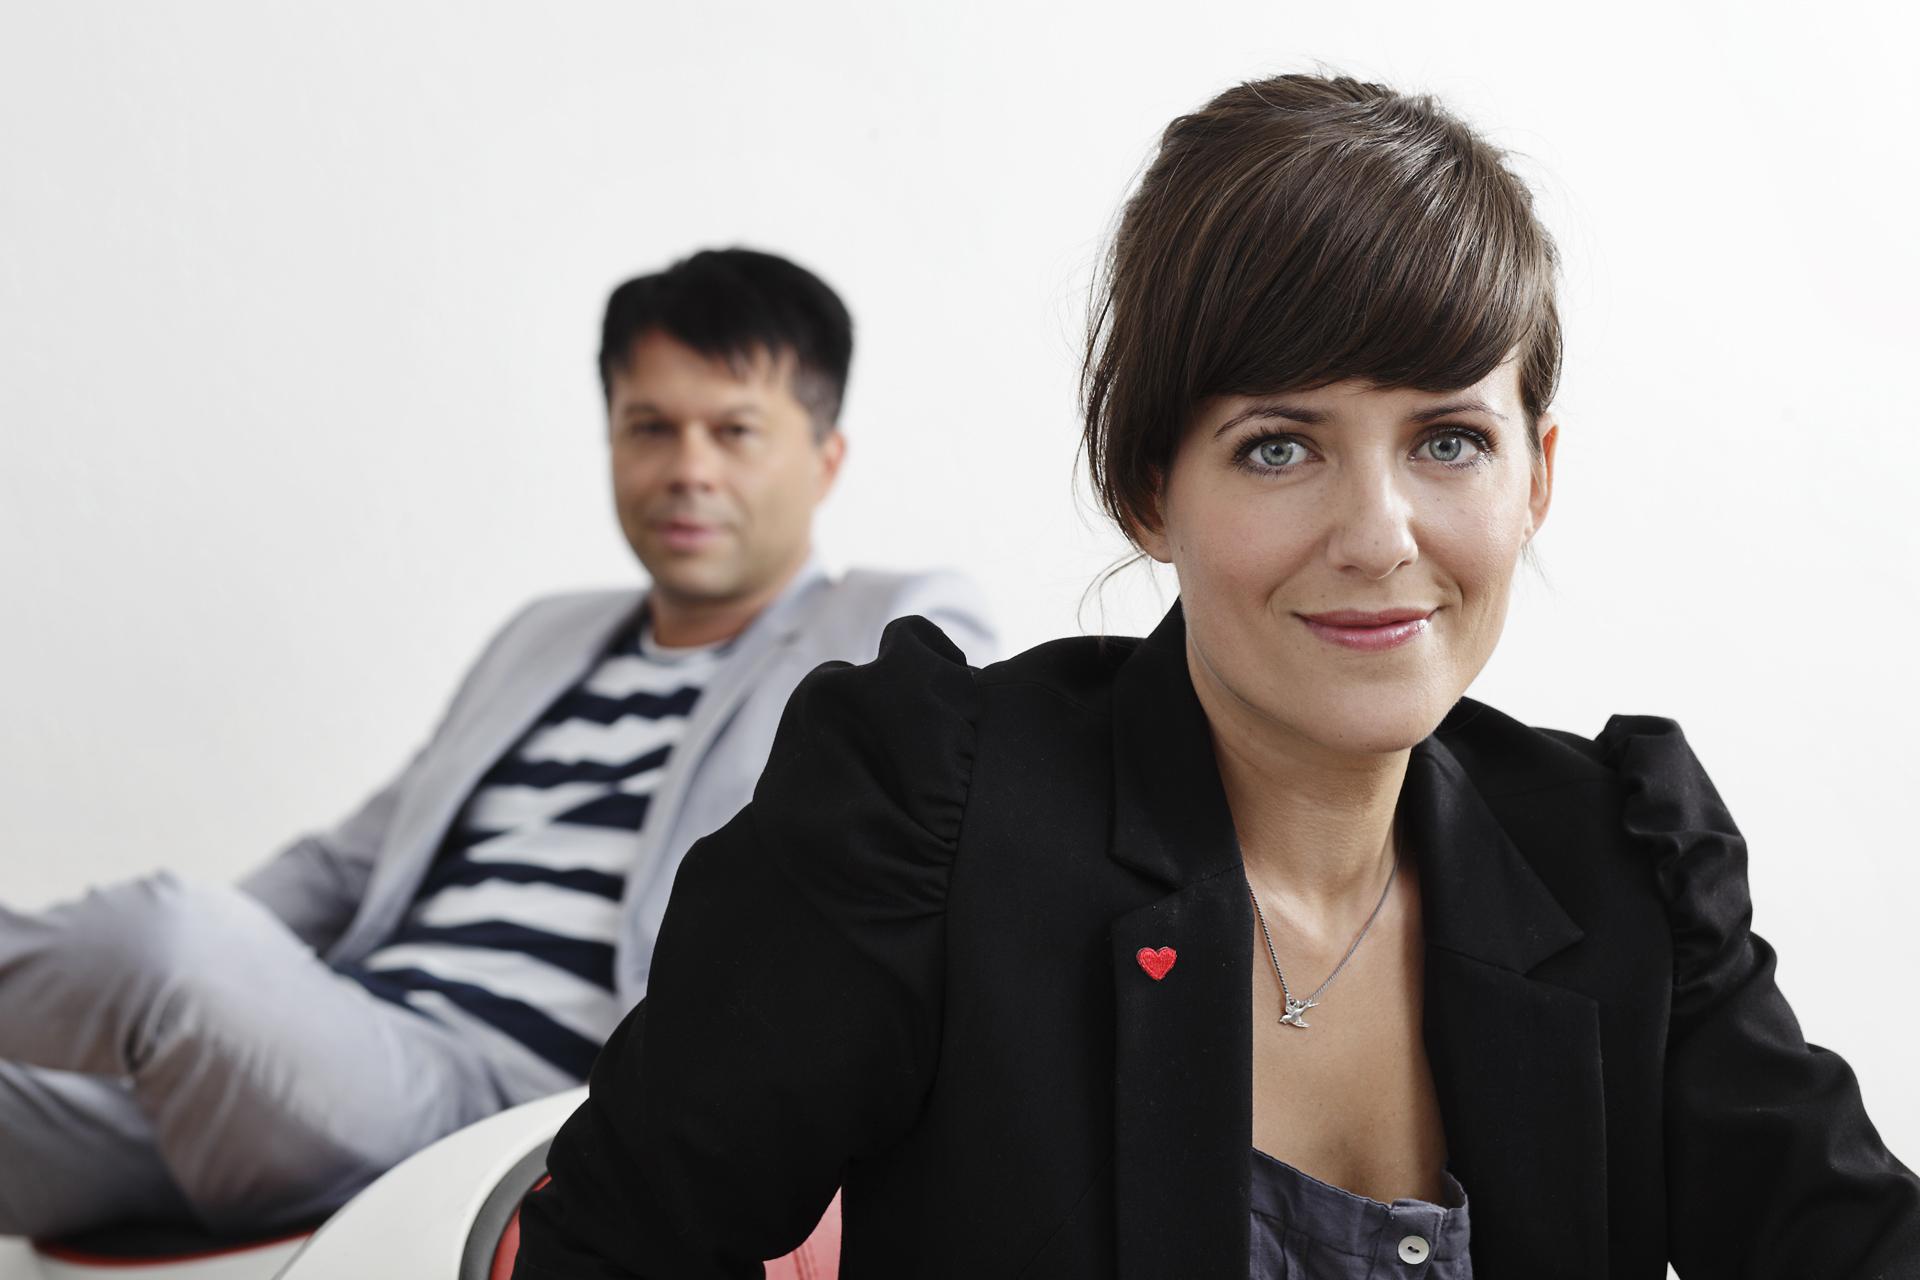 Frau Kuttner und Herr Kavka - Portrait